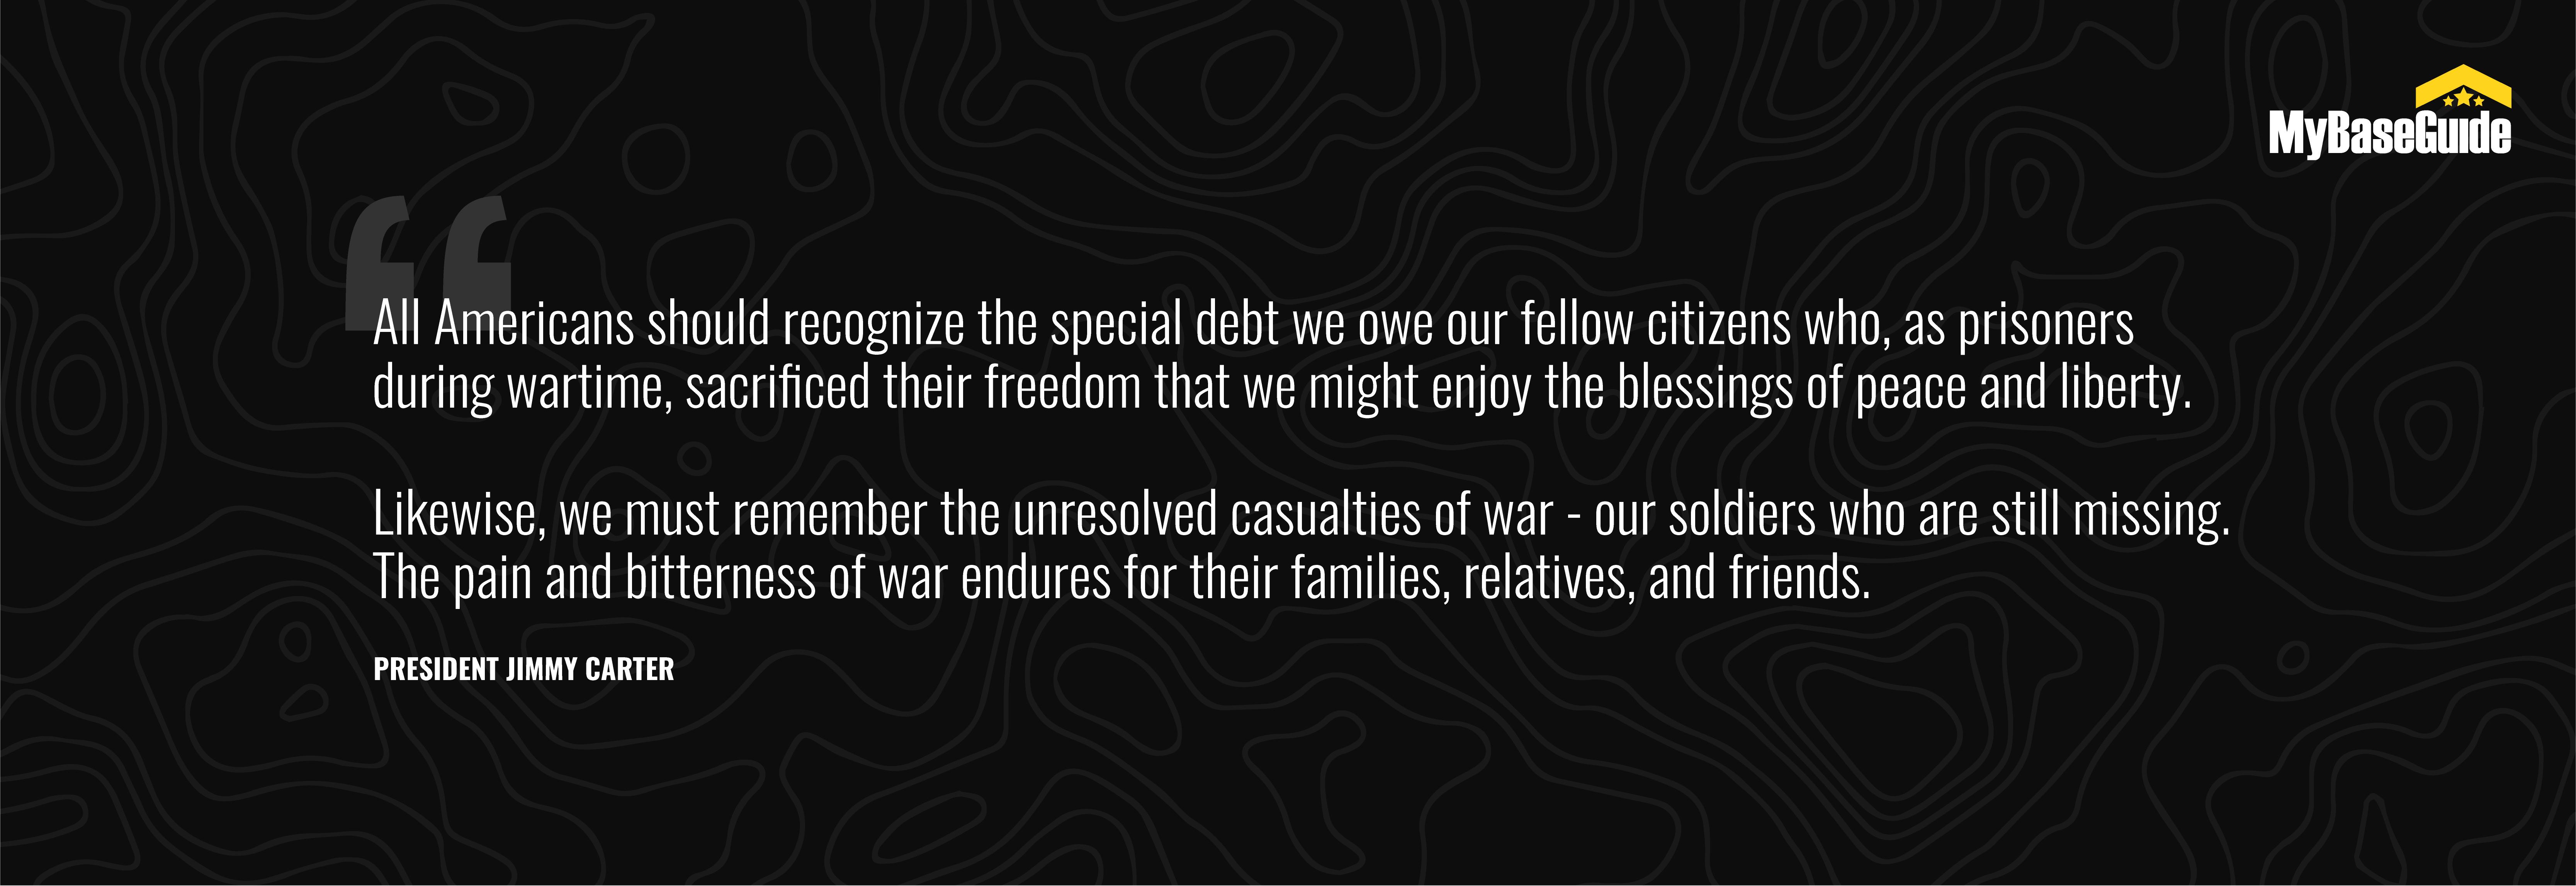 President Jimmy Carter POW/MIA Quote